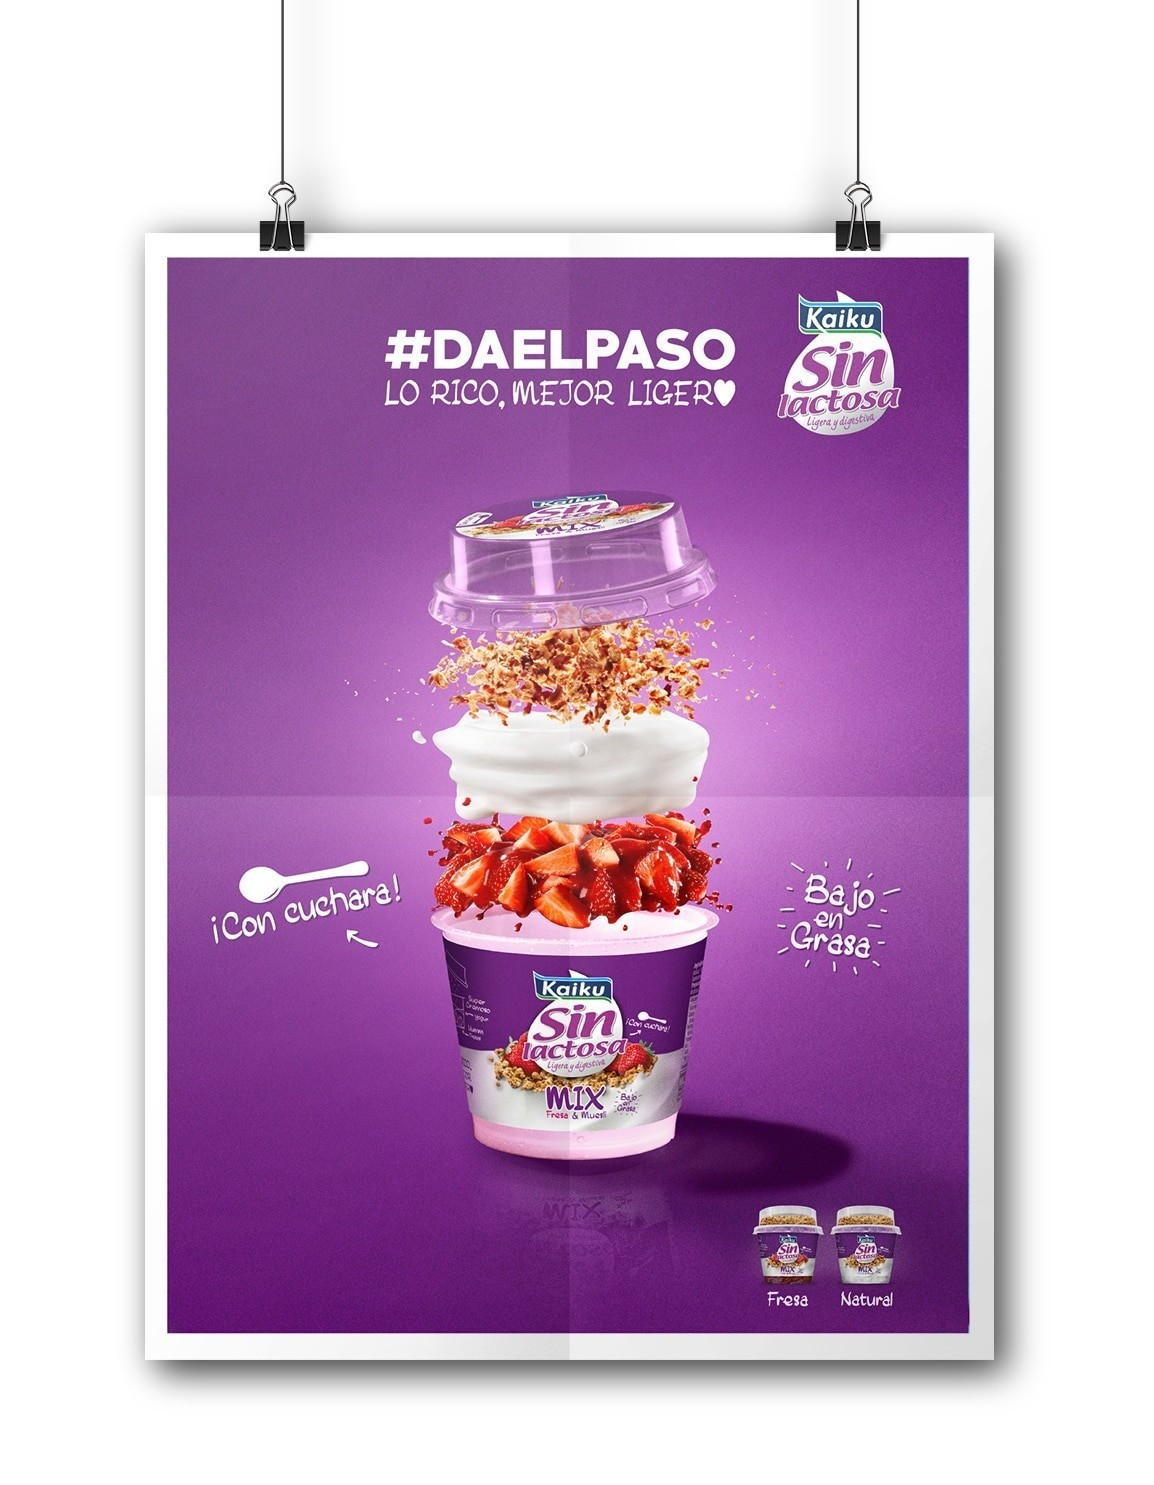 Packaging de Kaiku sin lactosa Mix